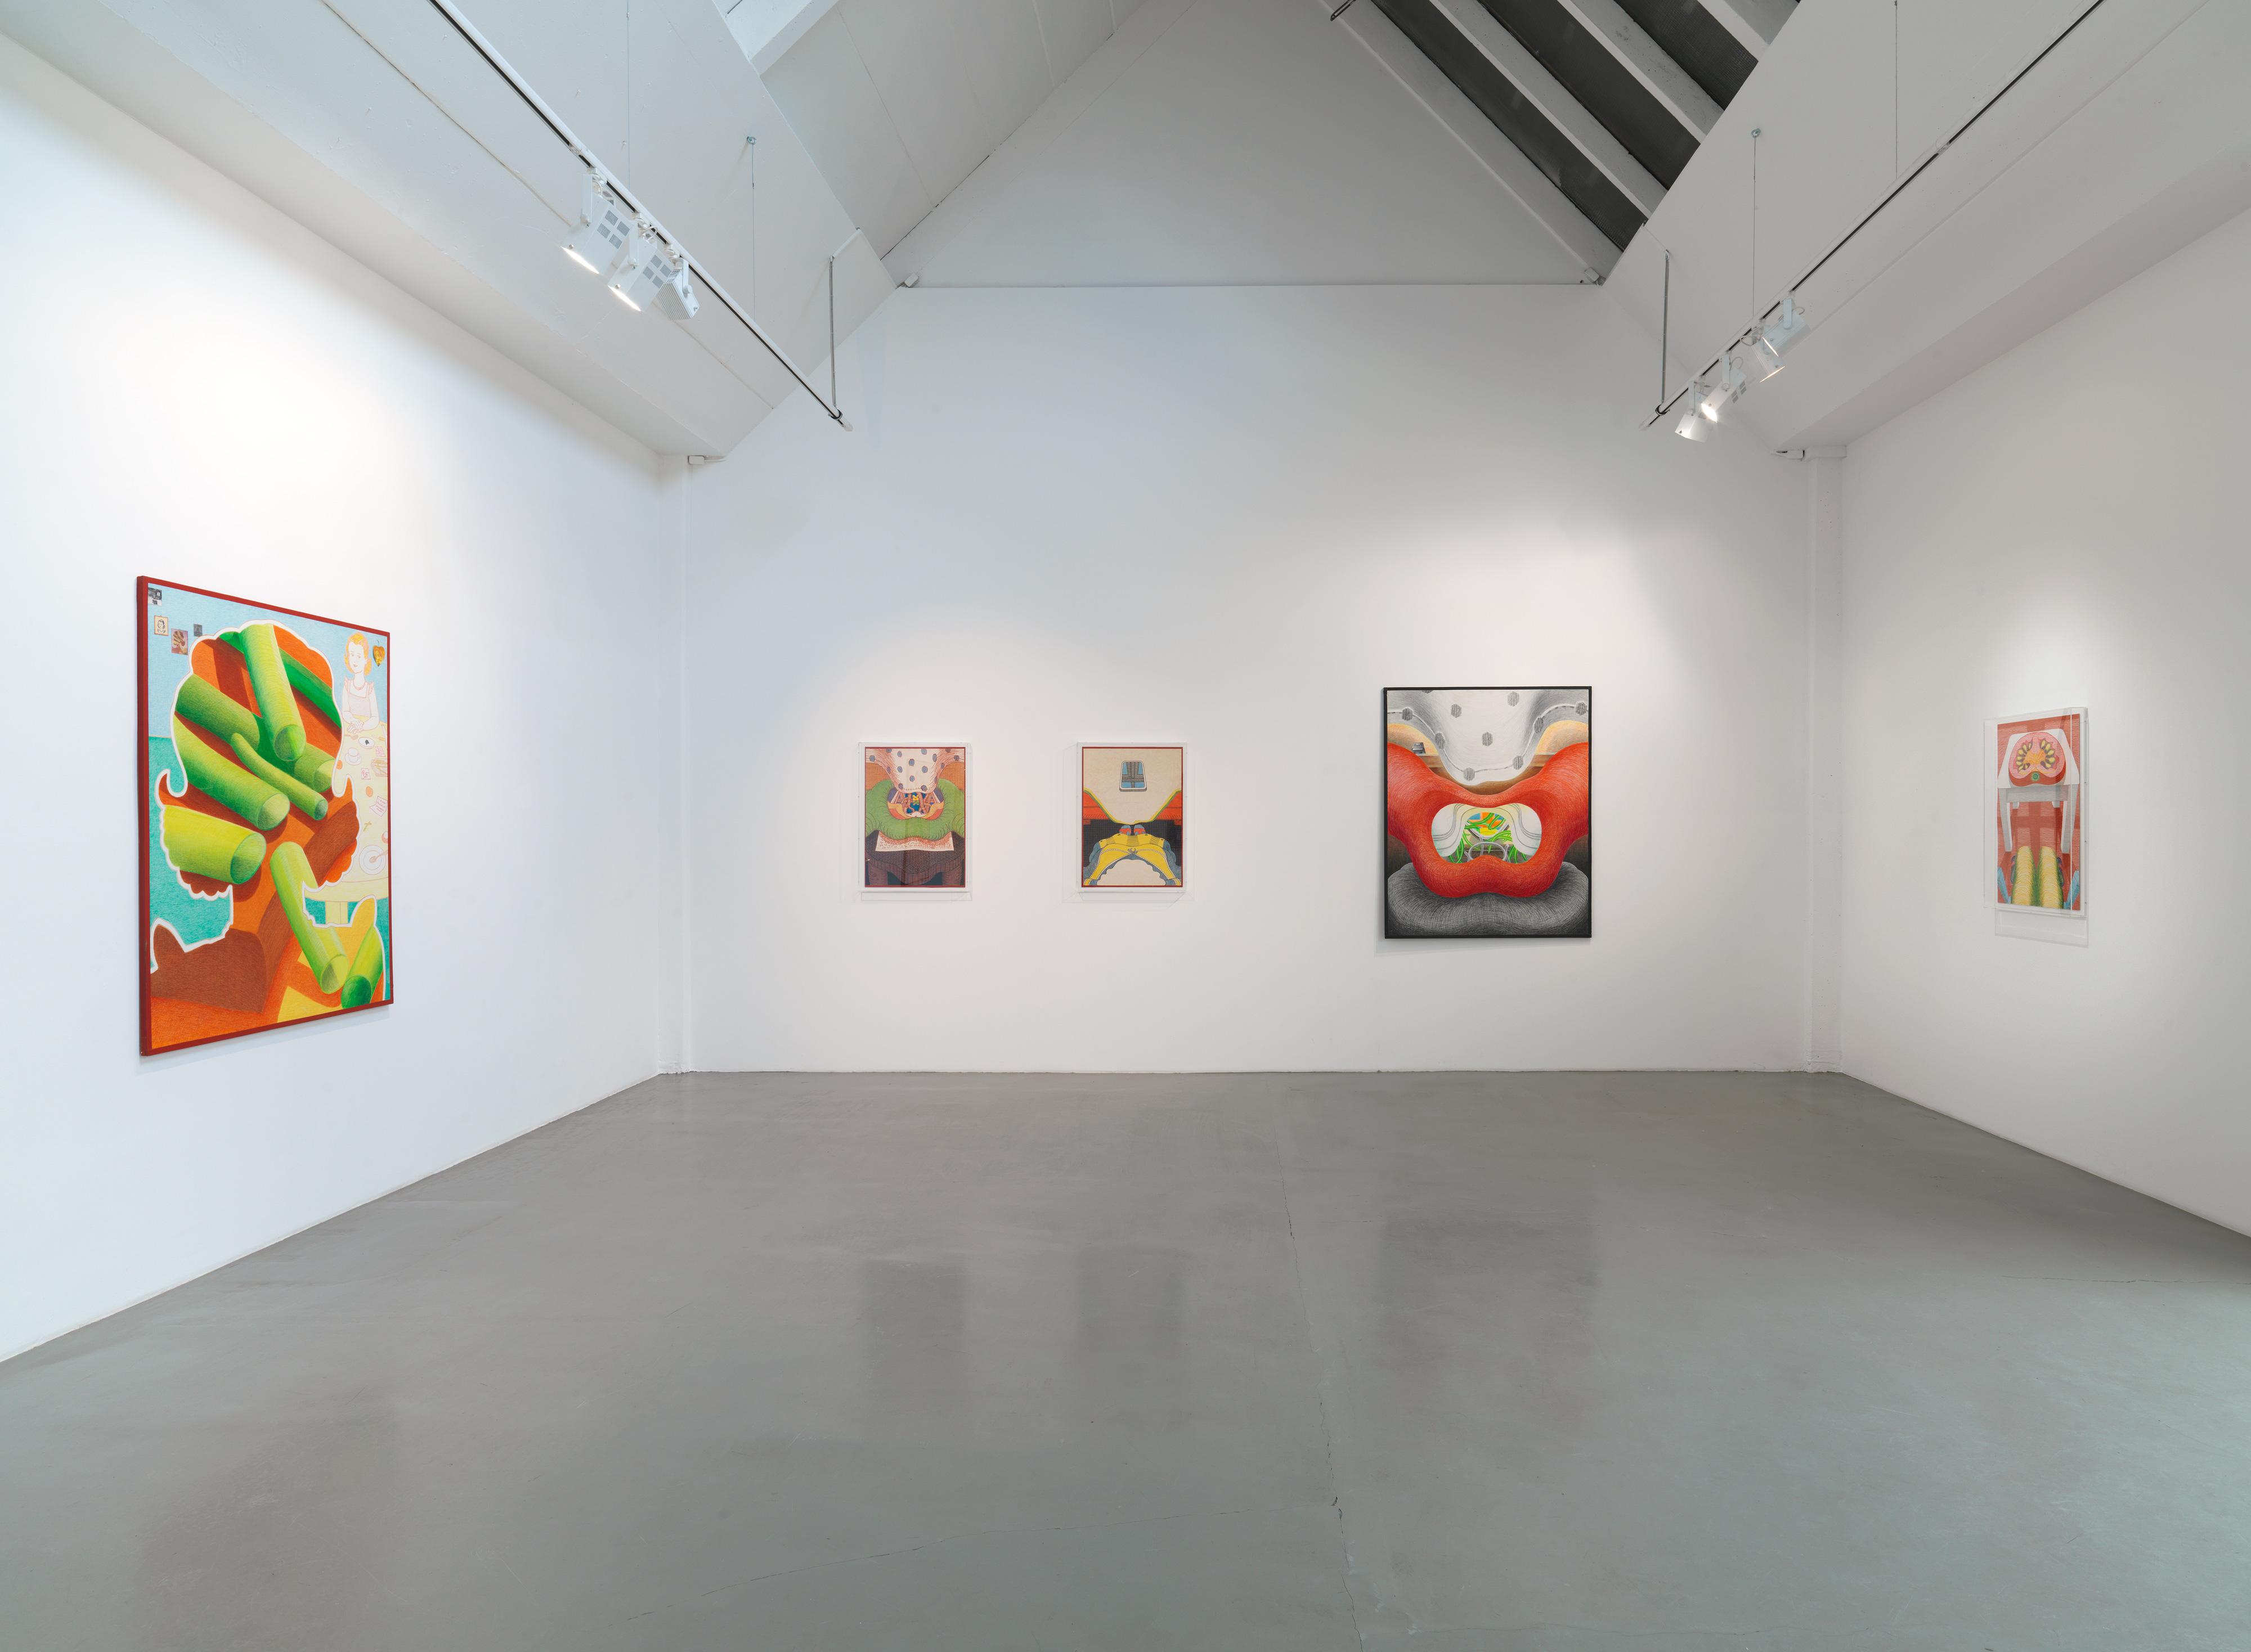 Galerie Barbara Thumm \ Anna Oppermann – Early works